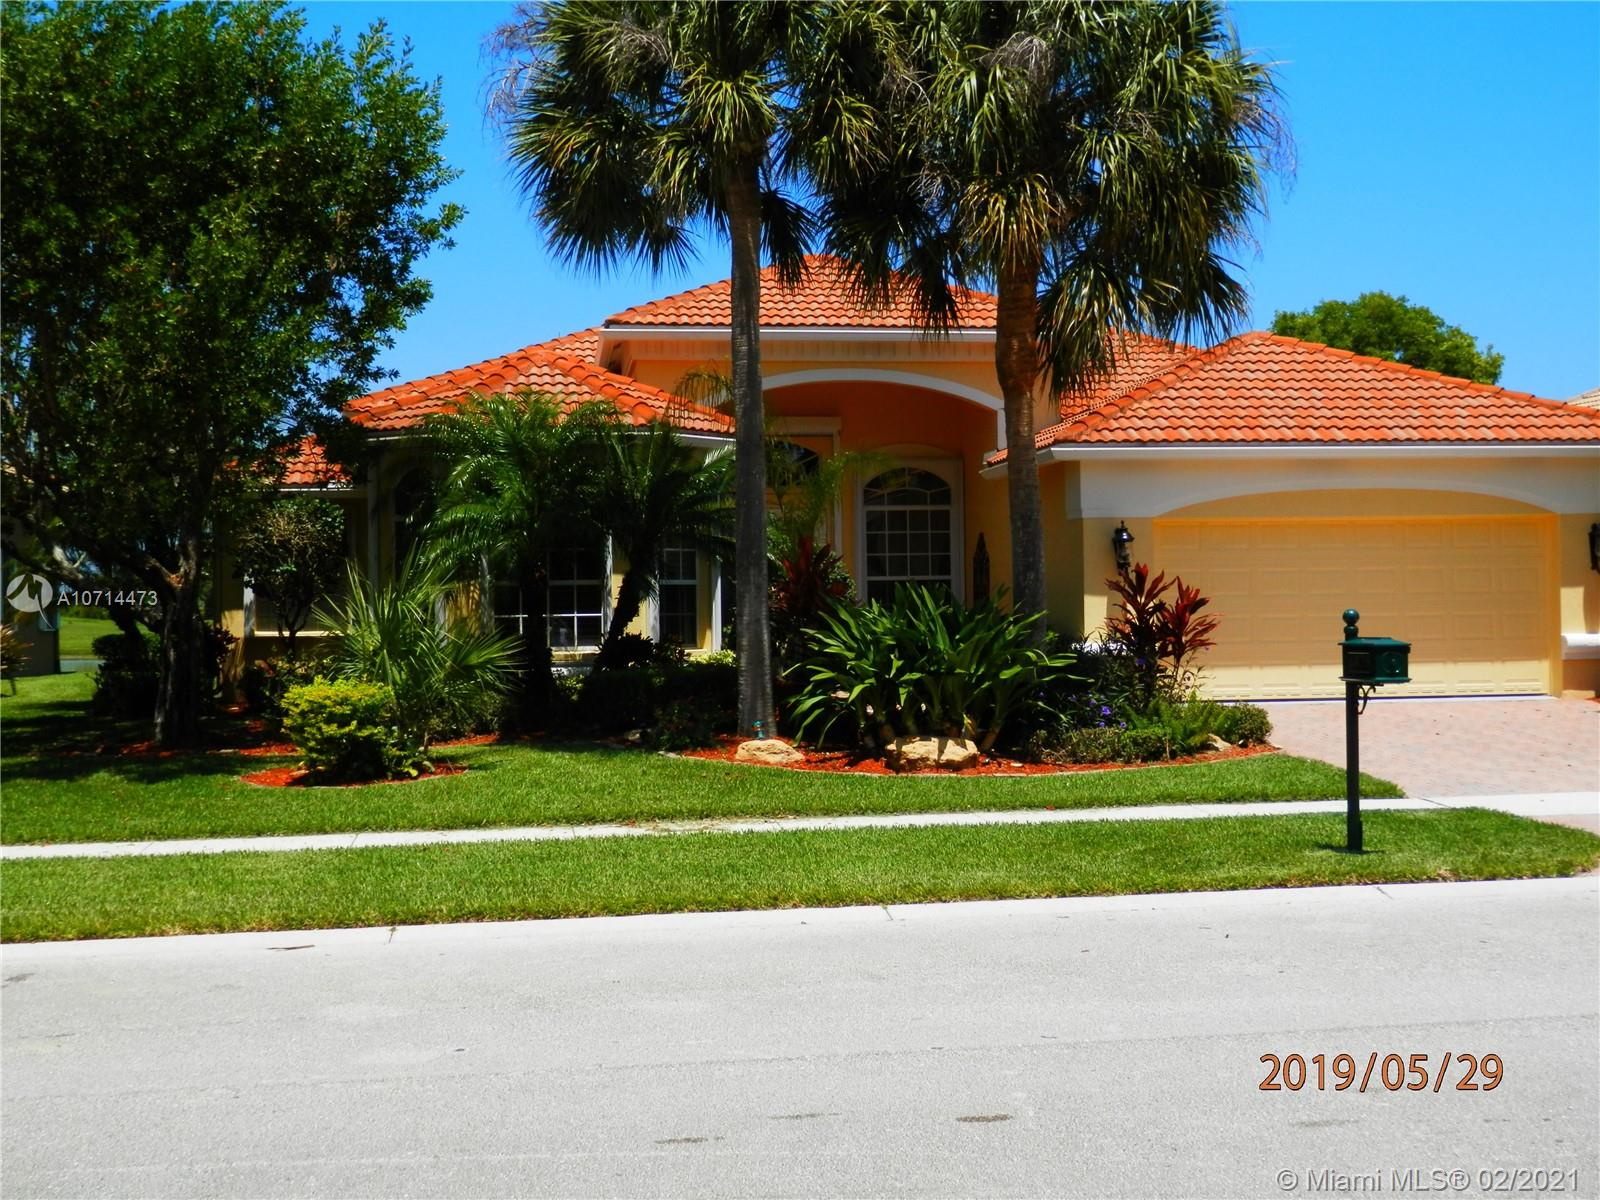 6875 Milani St, Lake Worth, FL 33467